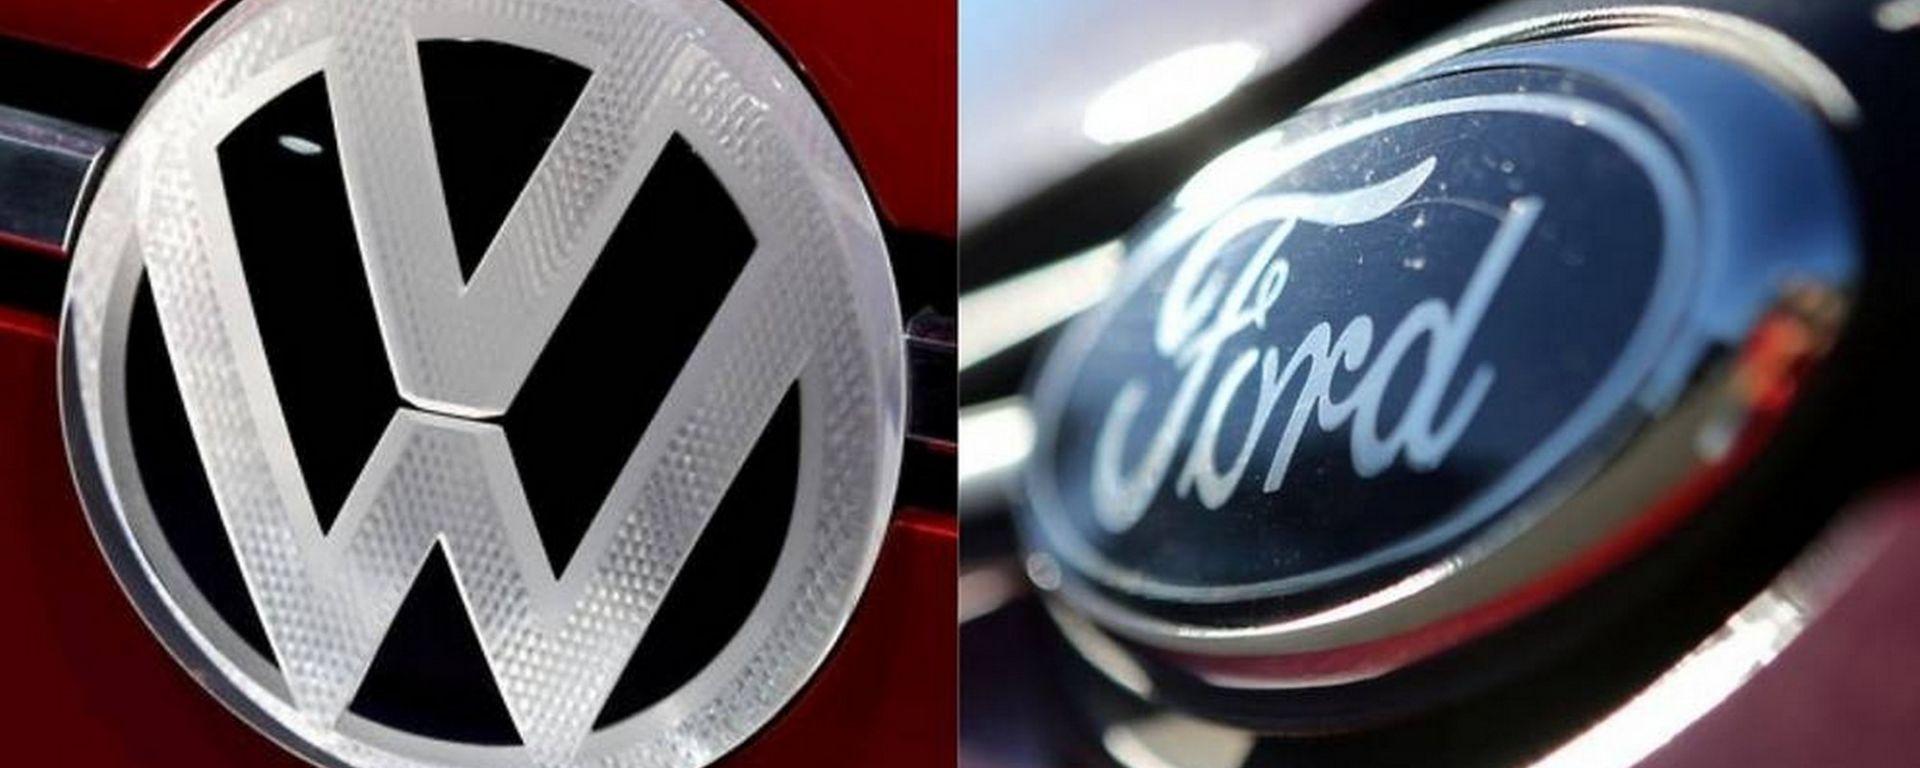 Ford Volkswagen, maxi alleanza in vista?